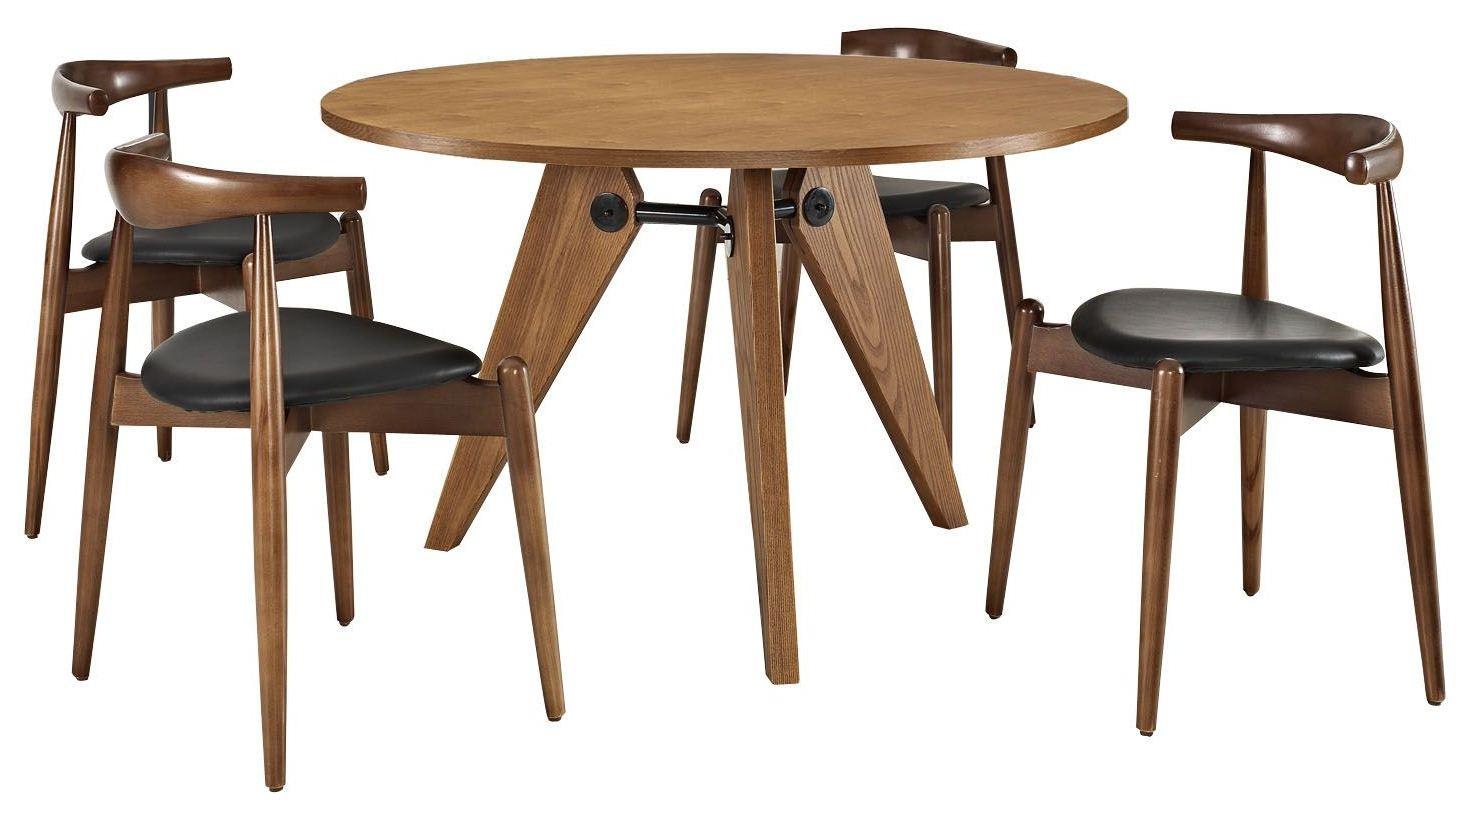 dark walnut dining chairs ninja turtle chair stalwart black and table set of